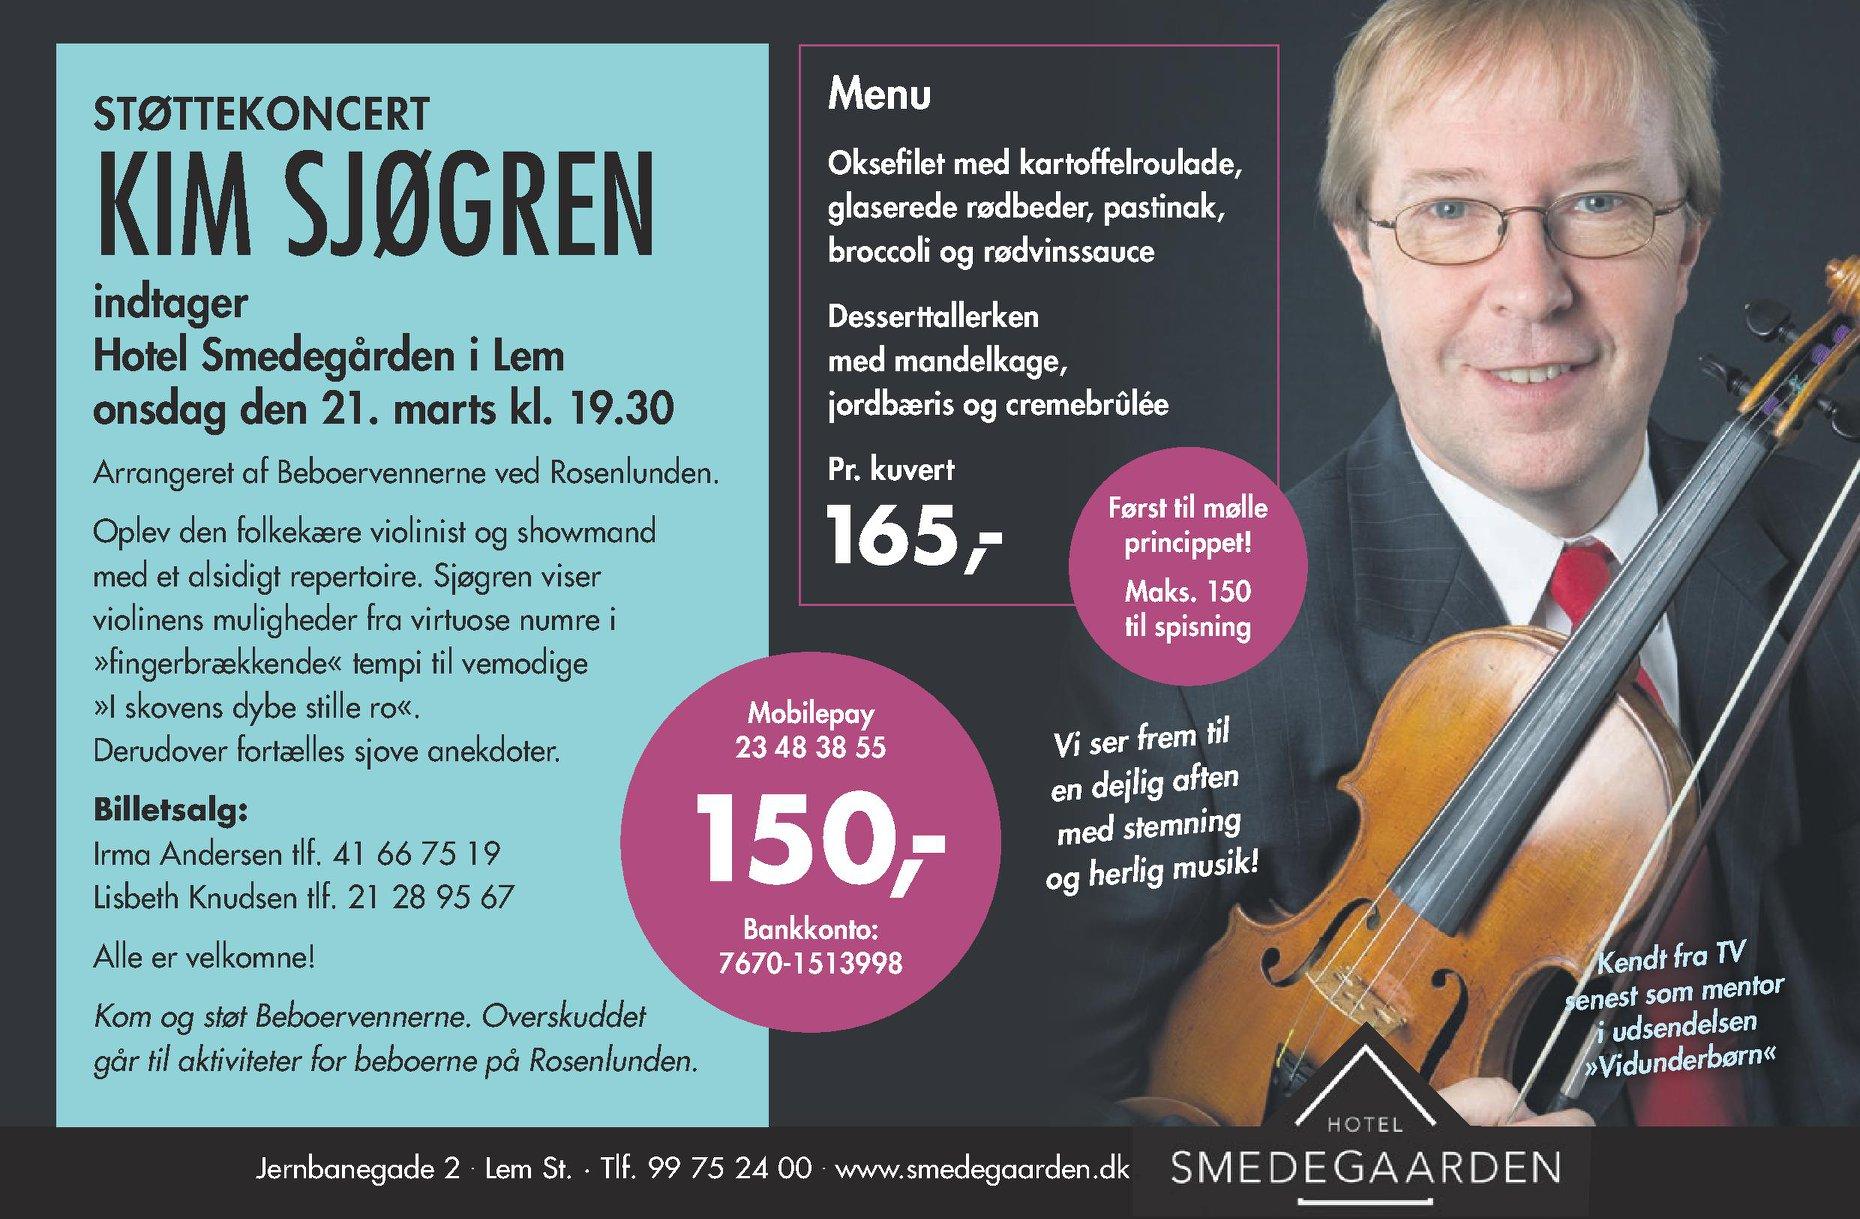 Kim Sjøgren koncert